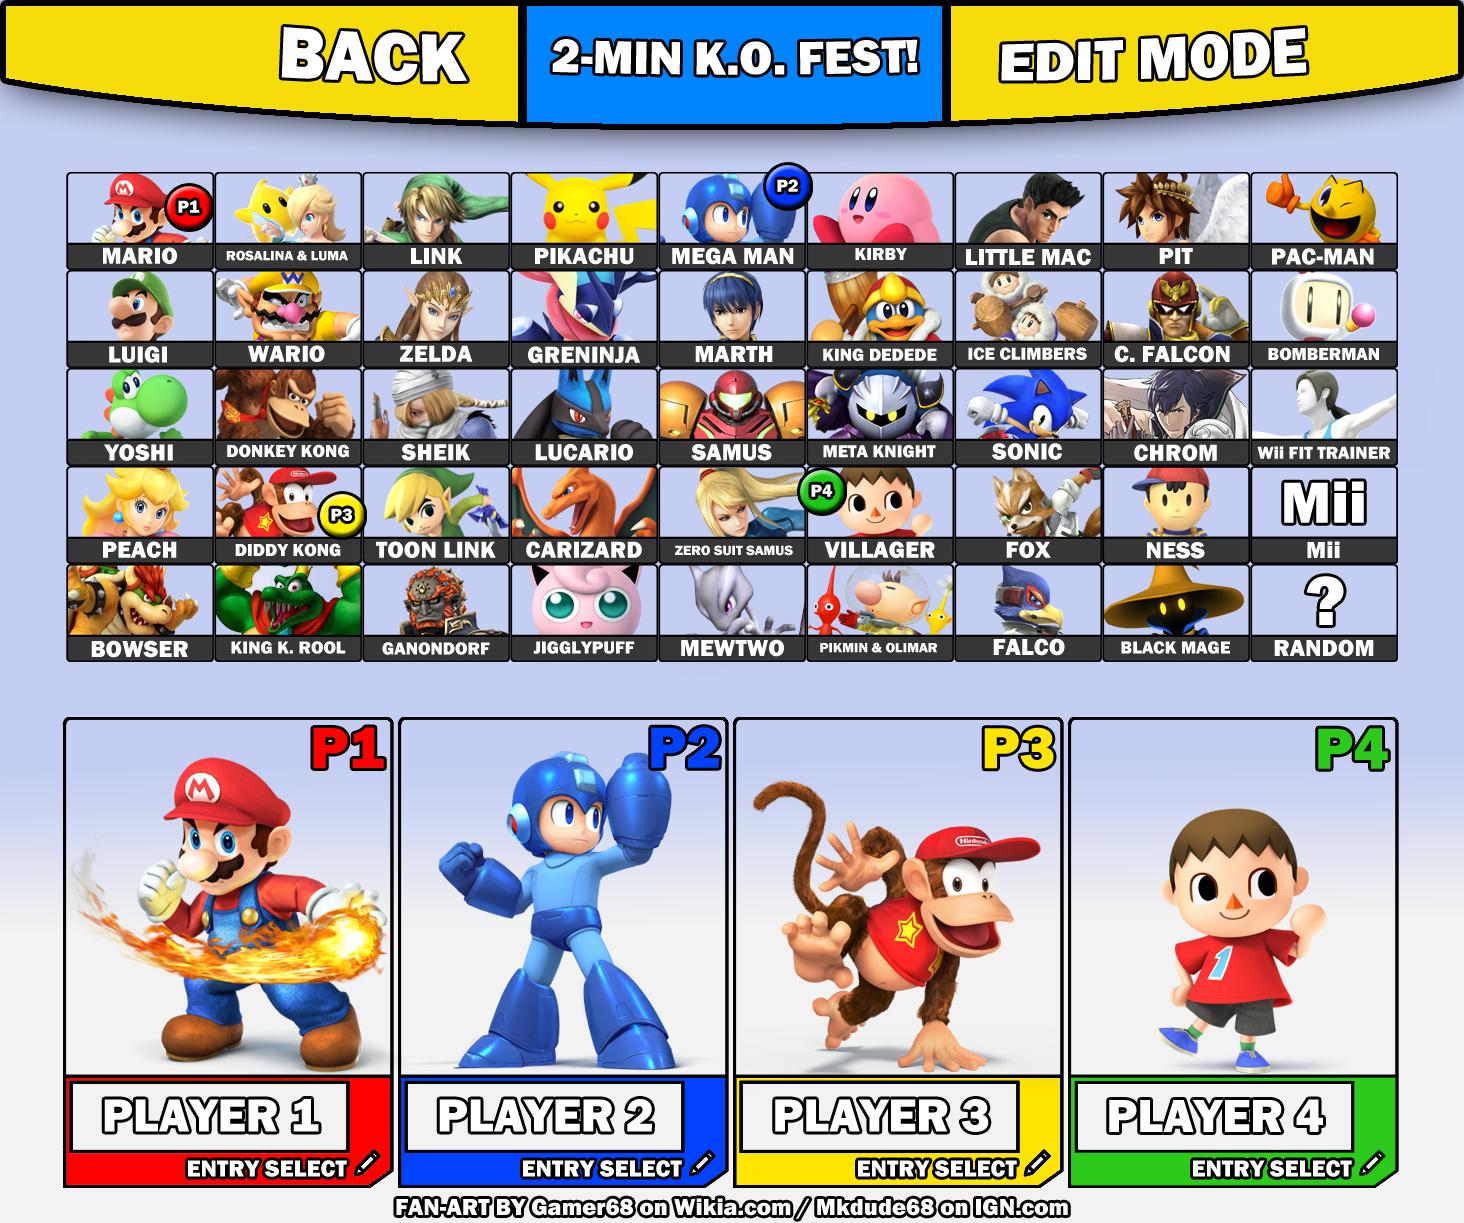 Super Smash Bros 3DS Amp Wii U Fan Roster UPDATE